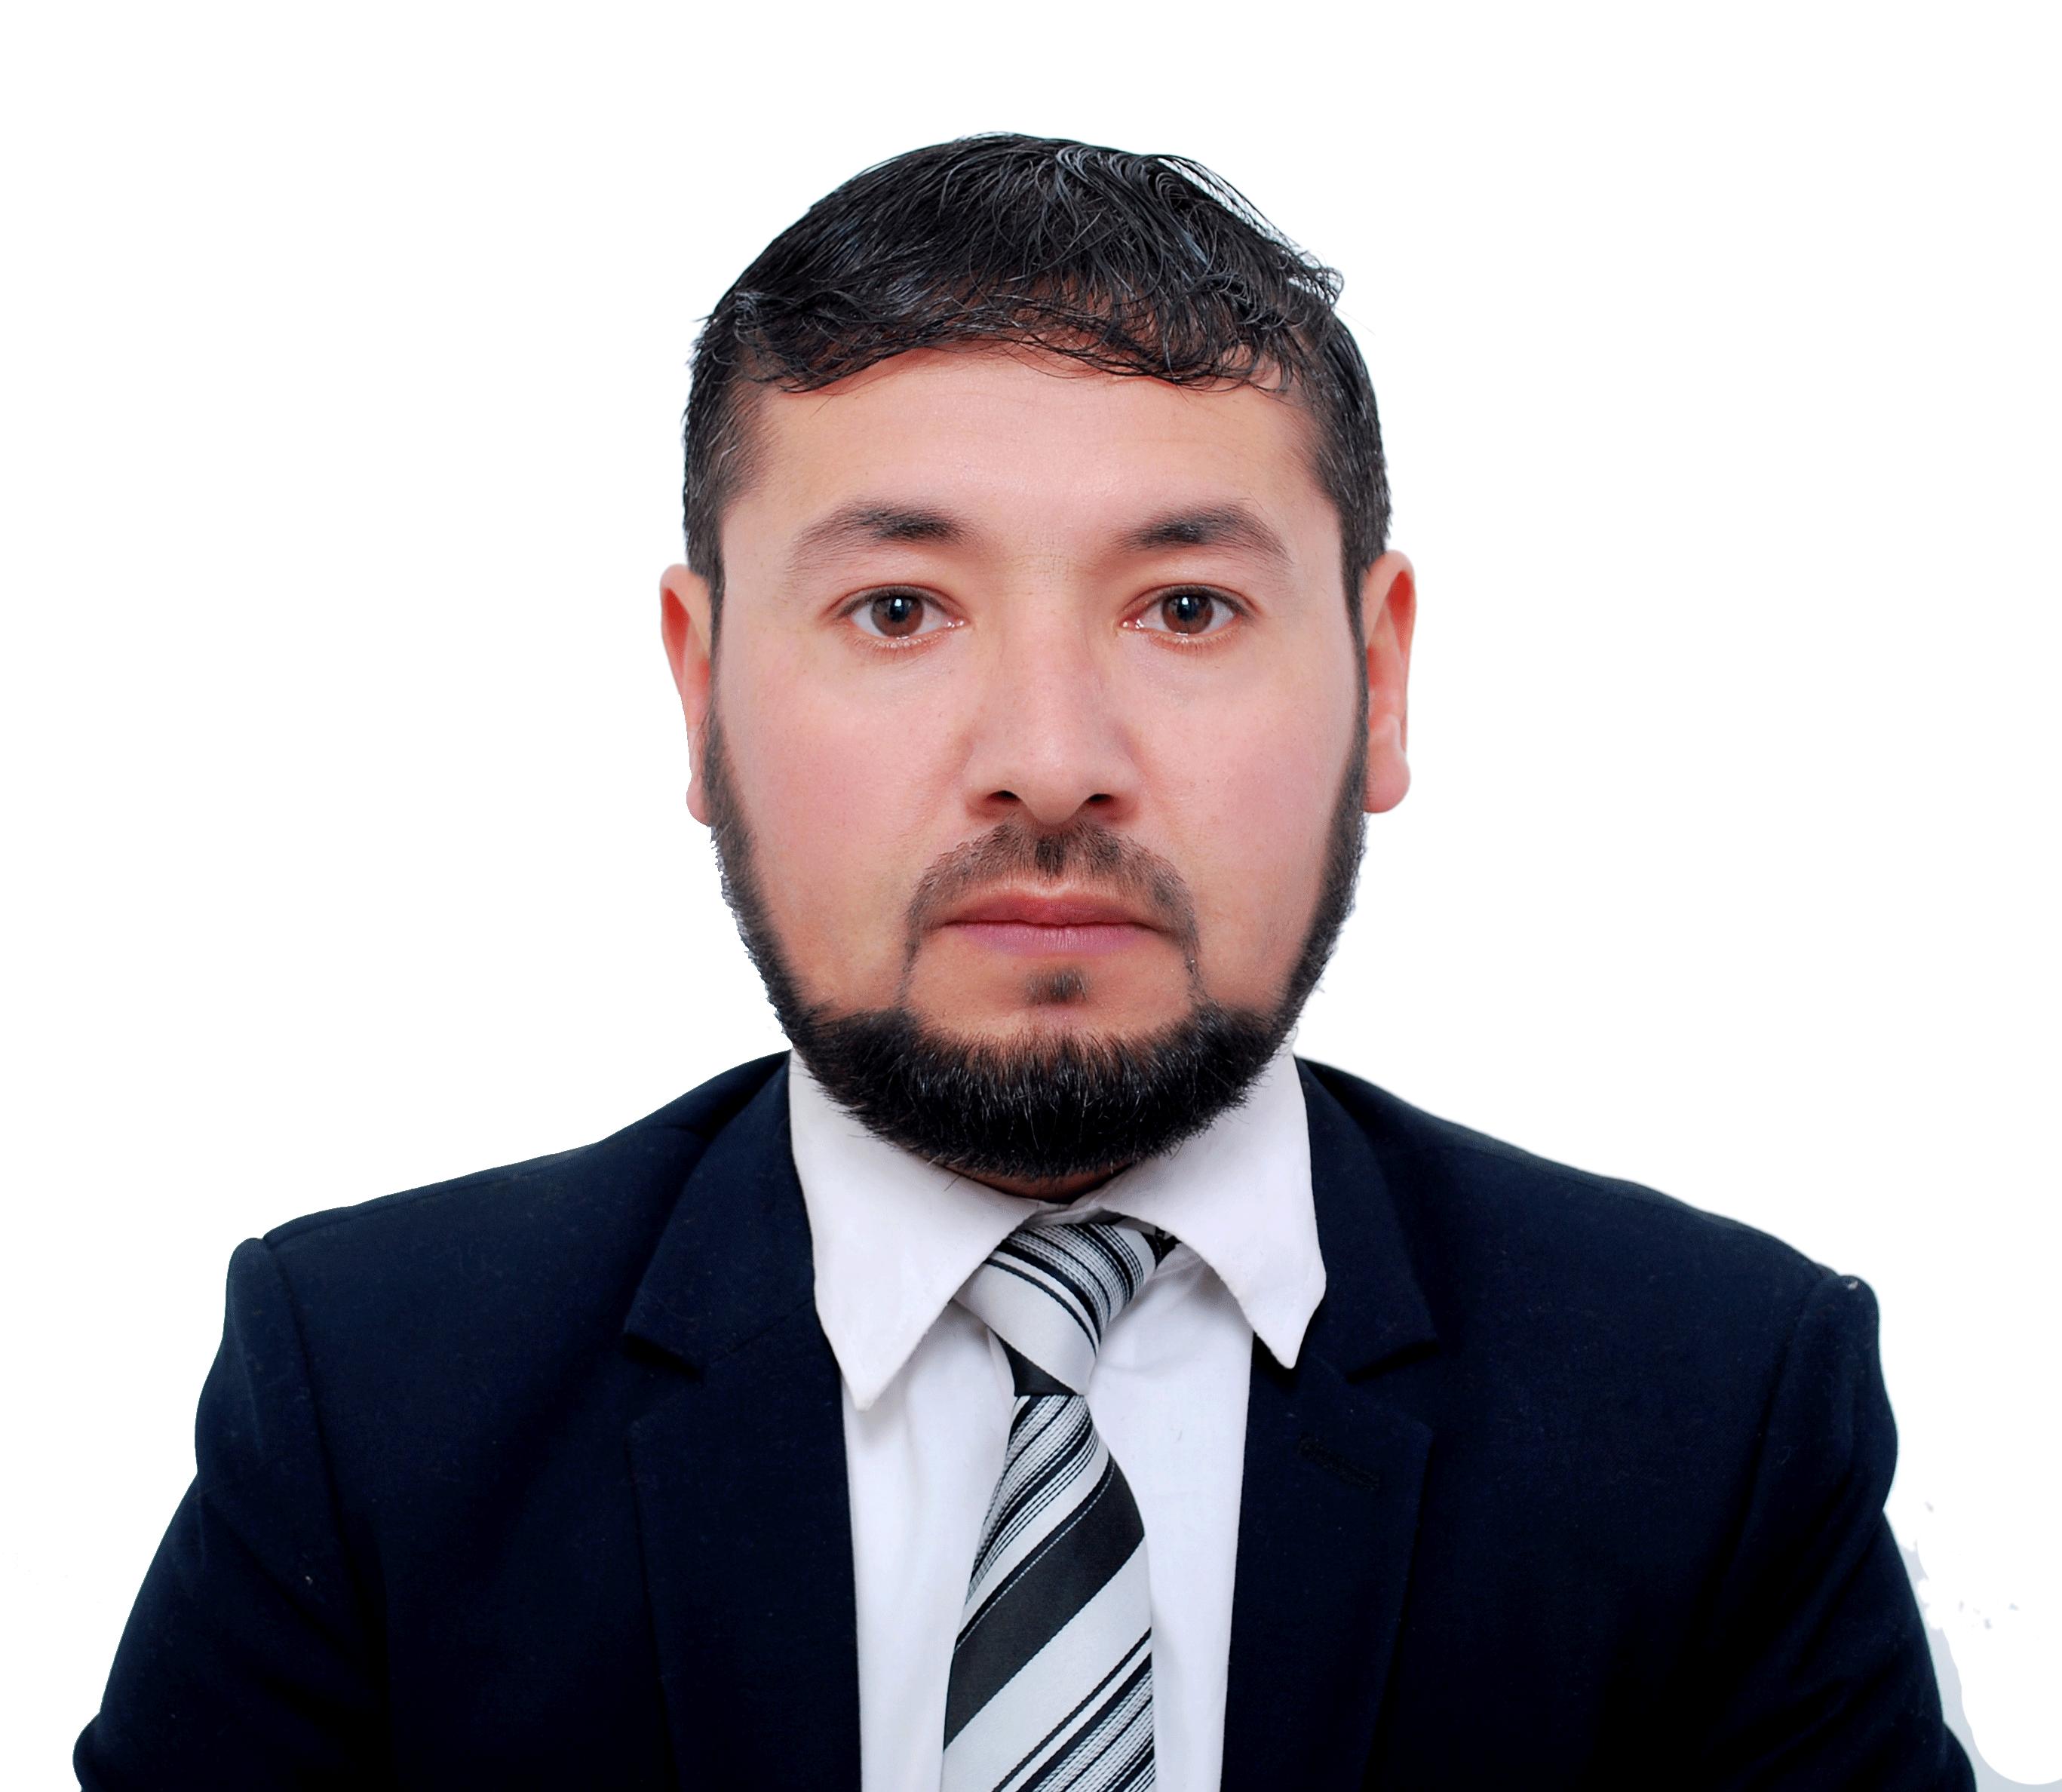 Abdul Kabir Jawzjani